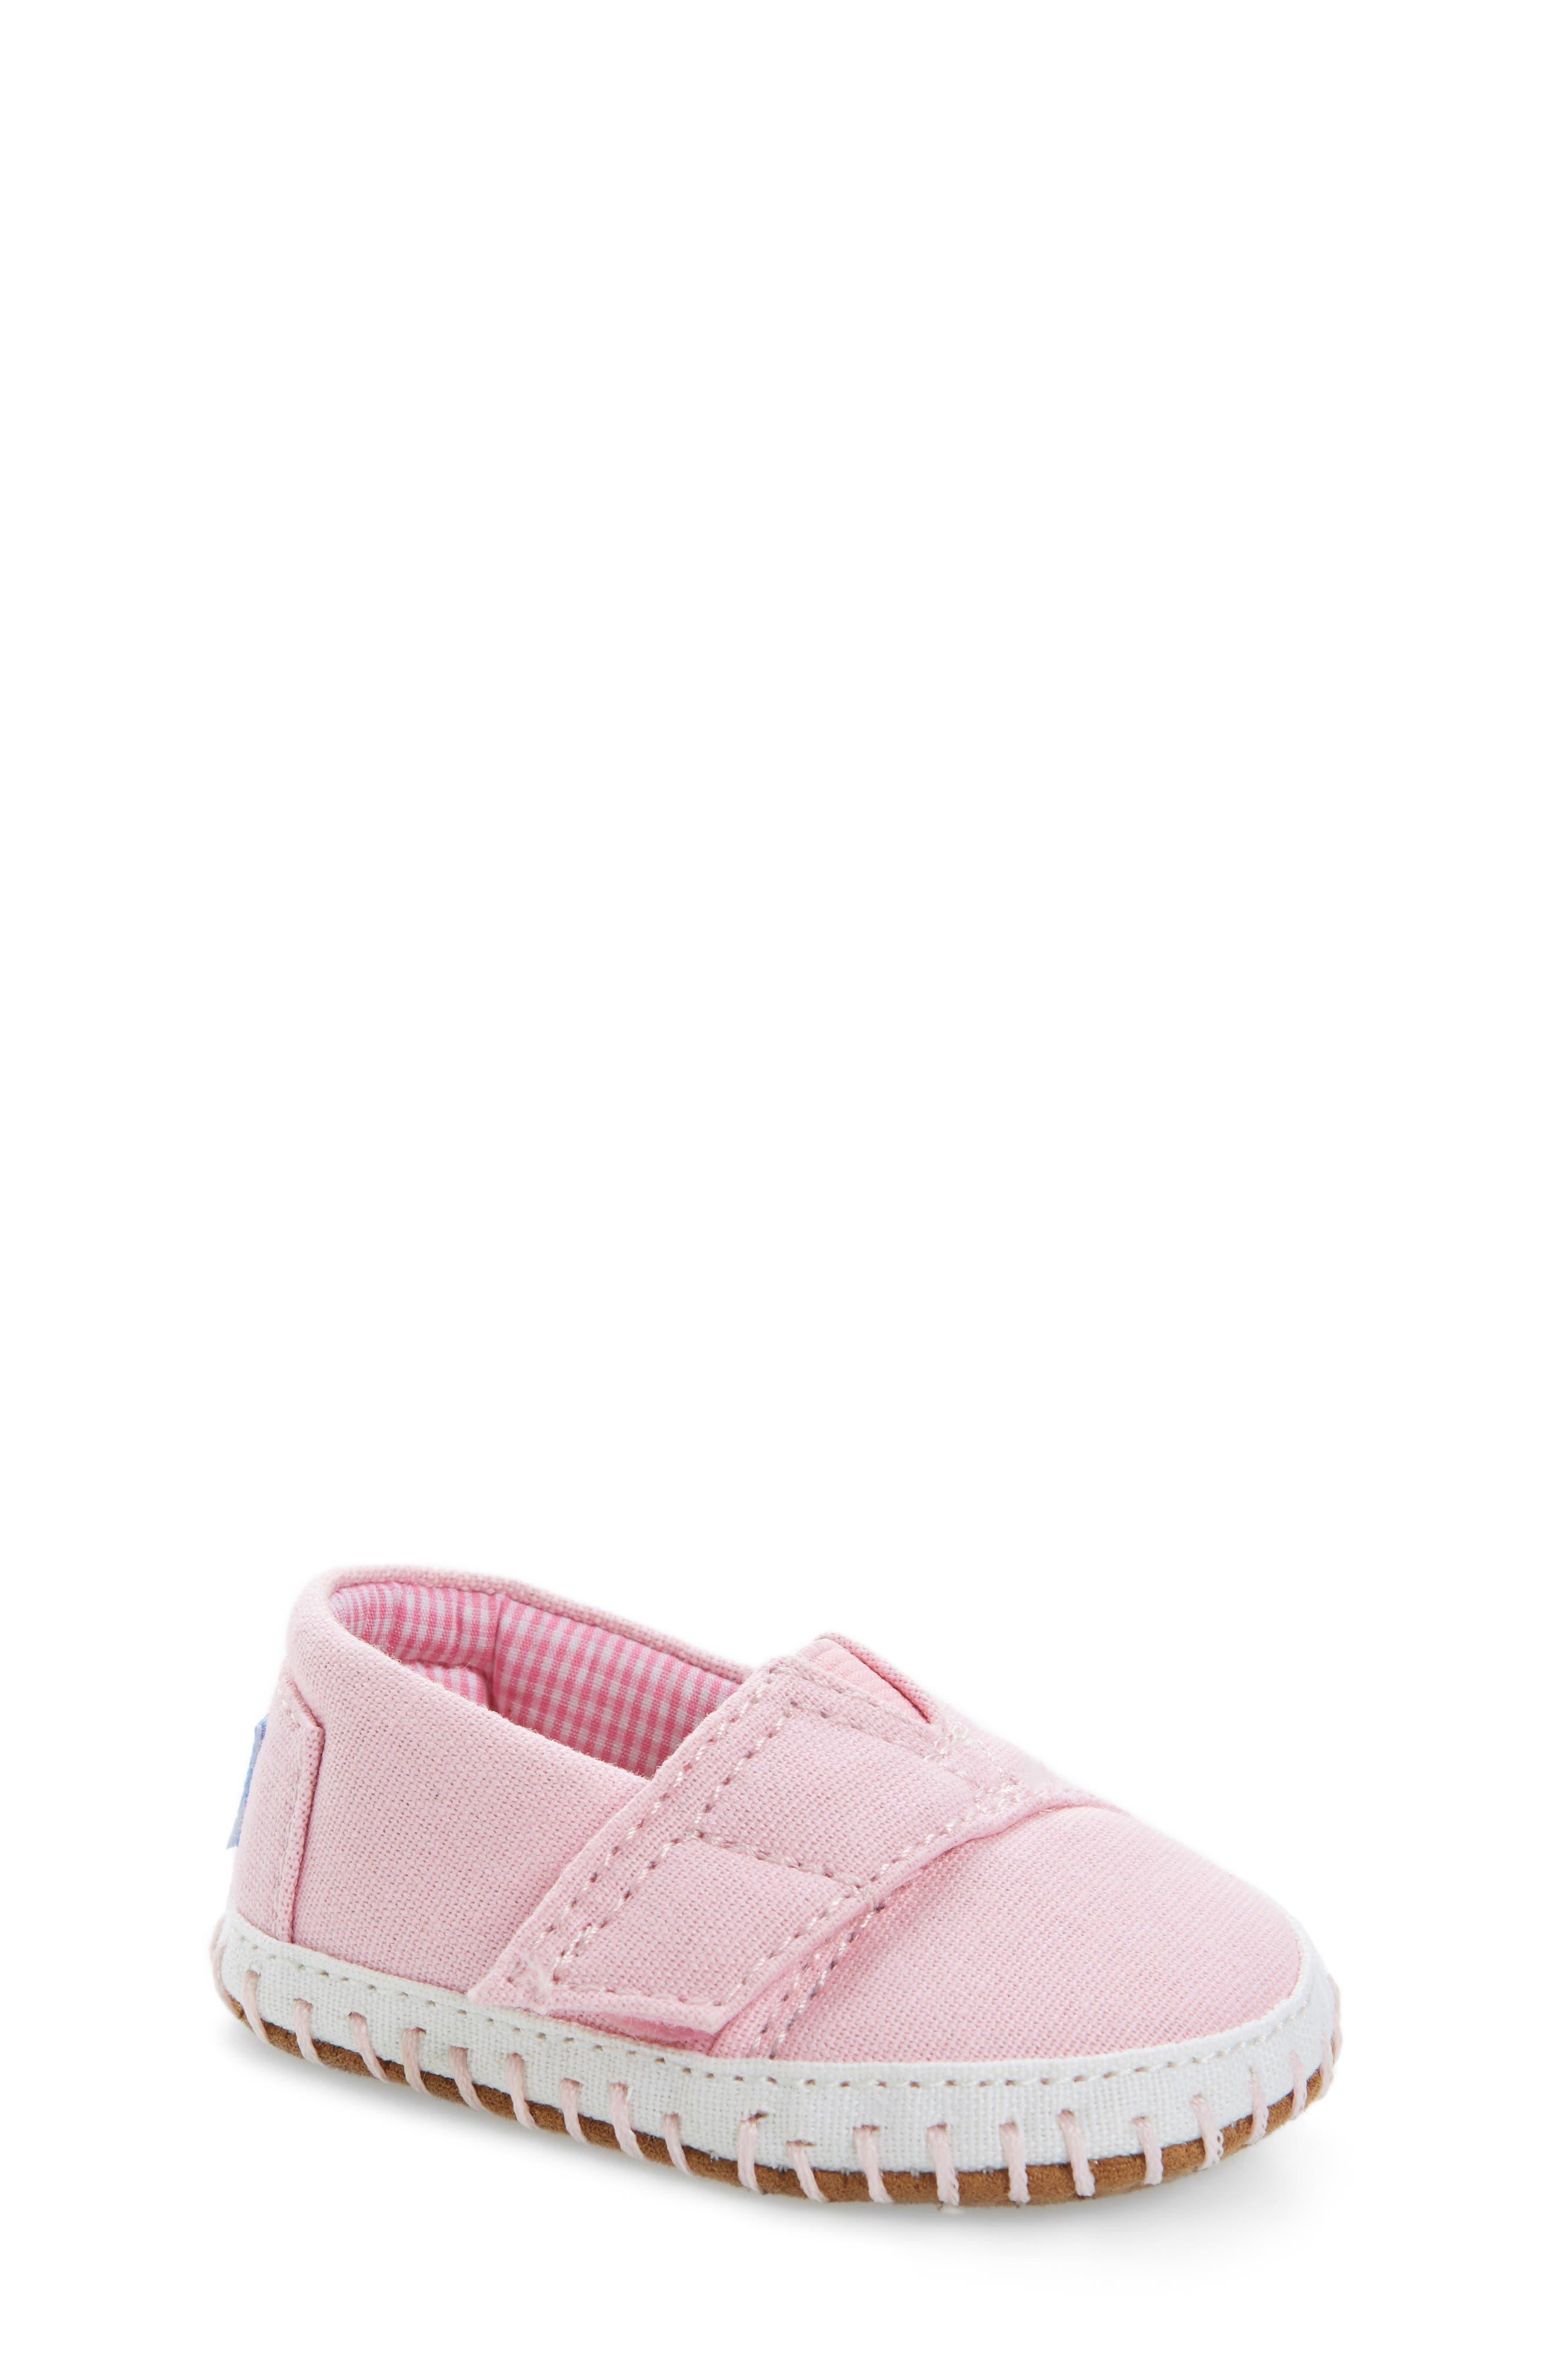 x crib toms kate spade keds cribs main york shoe champion shoes image baby new pin glitter